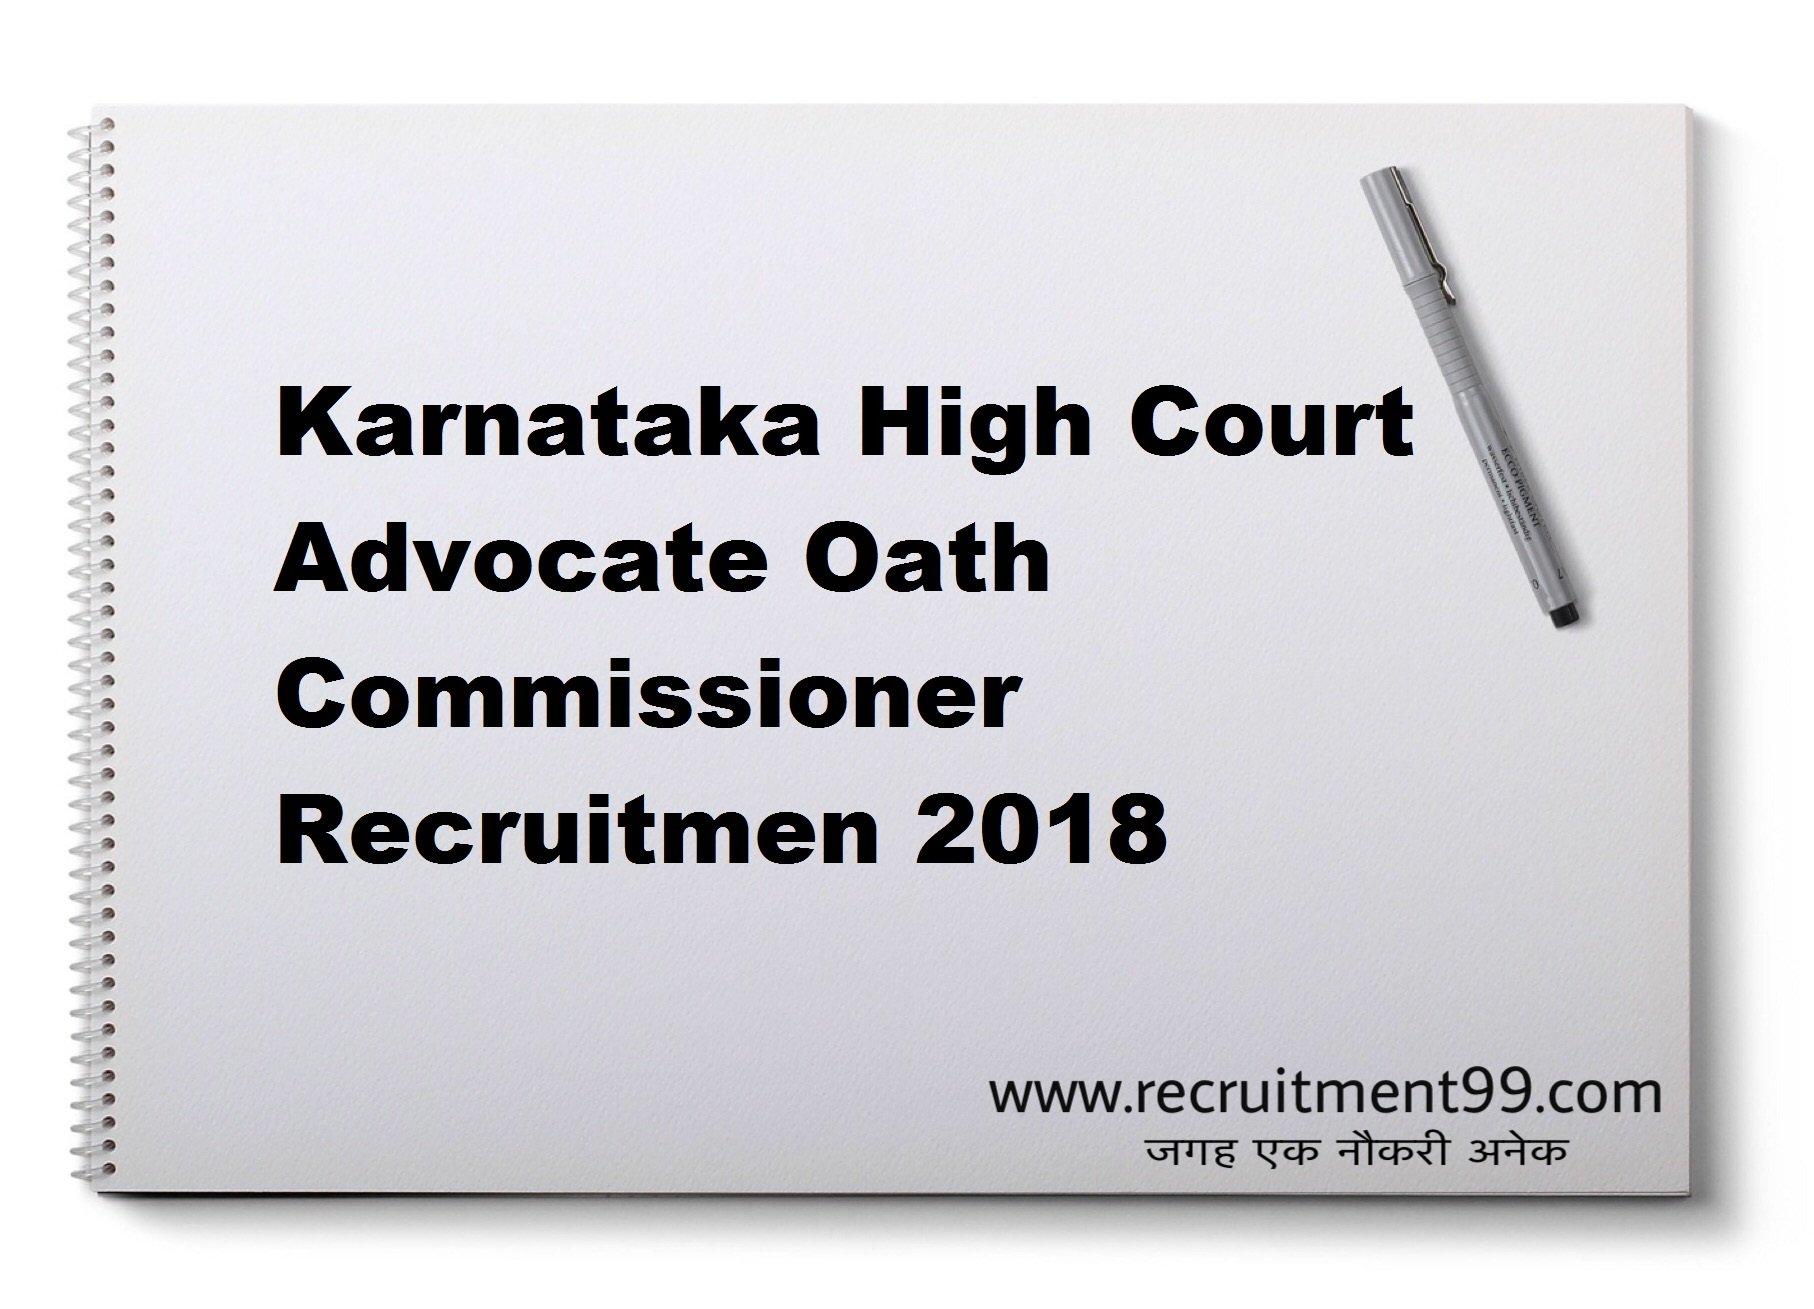 Karnataka HC Advocate Oath Commissioner Recruitment Hall Ticket Result 2018